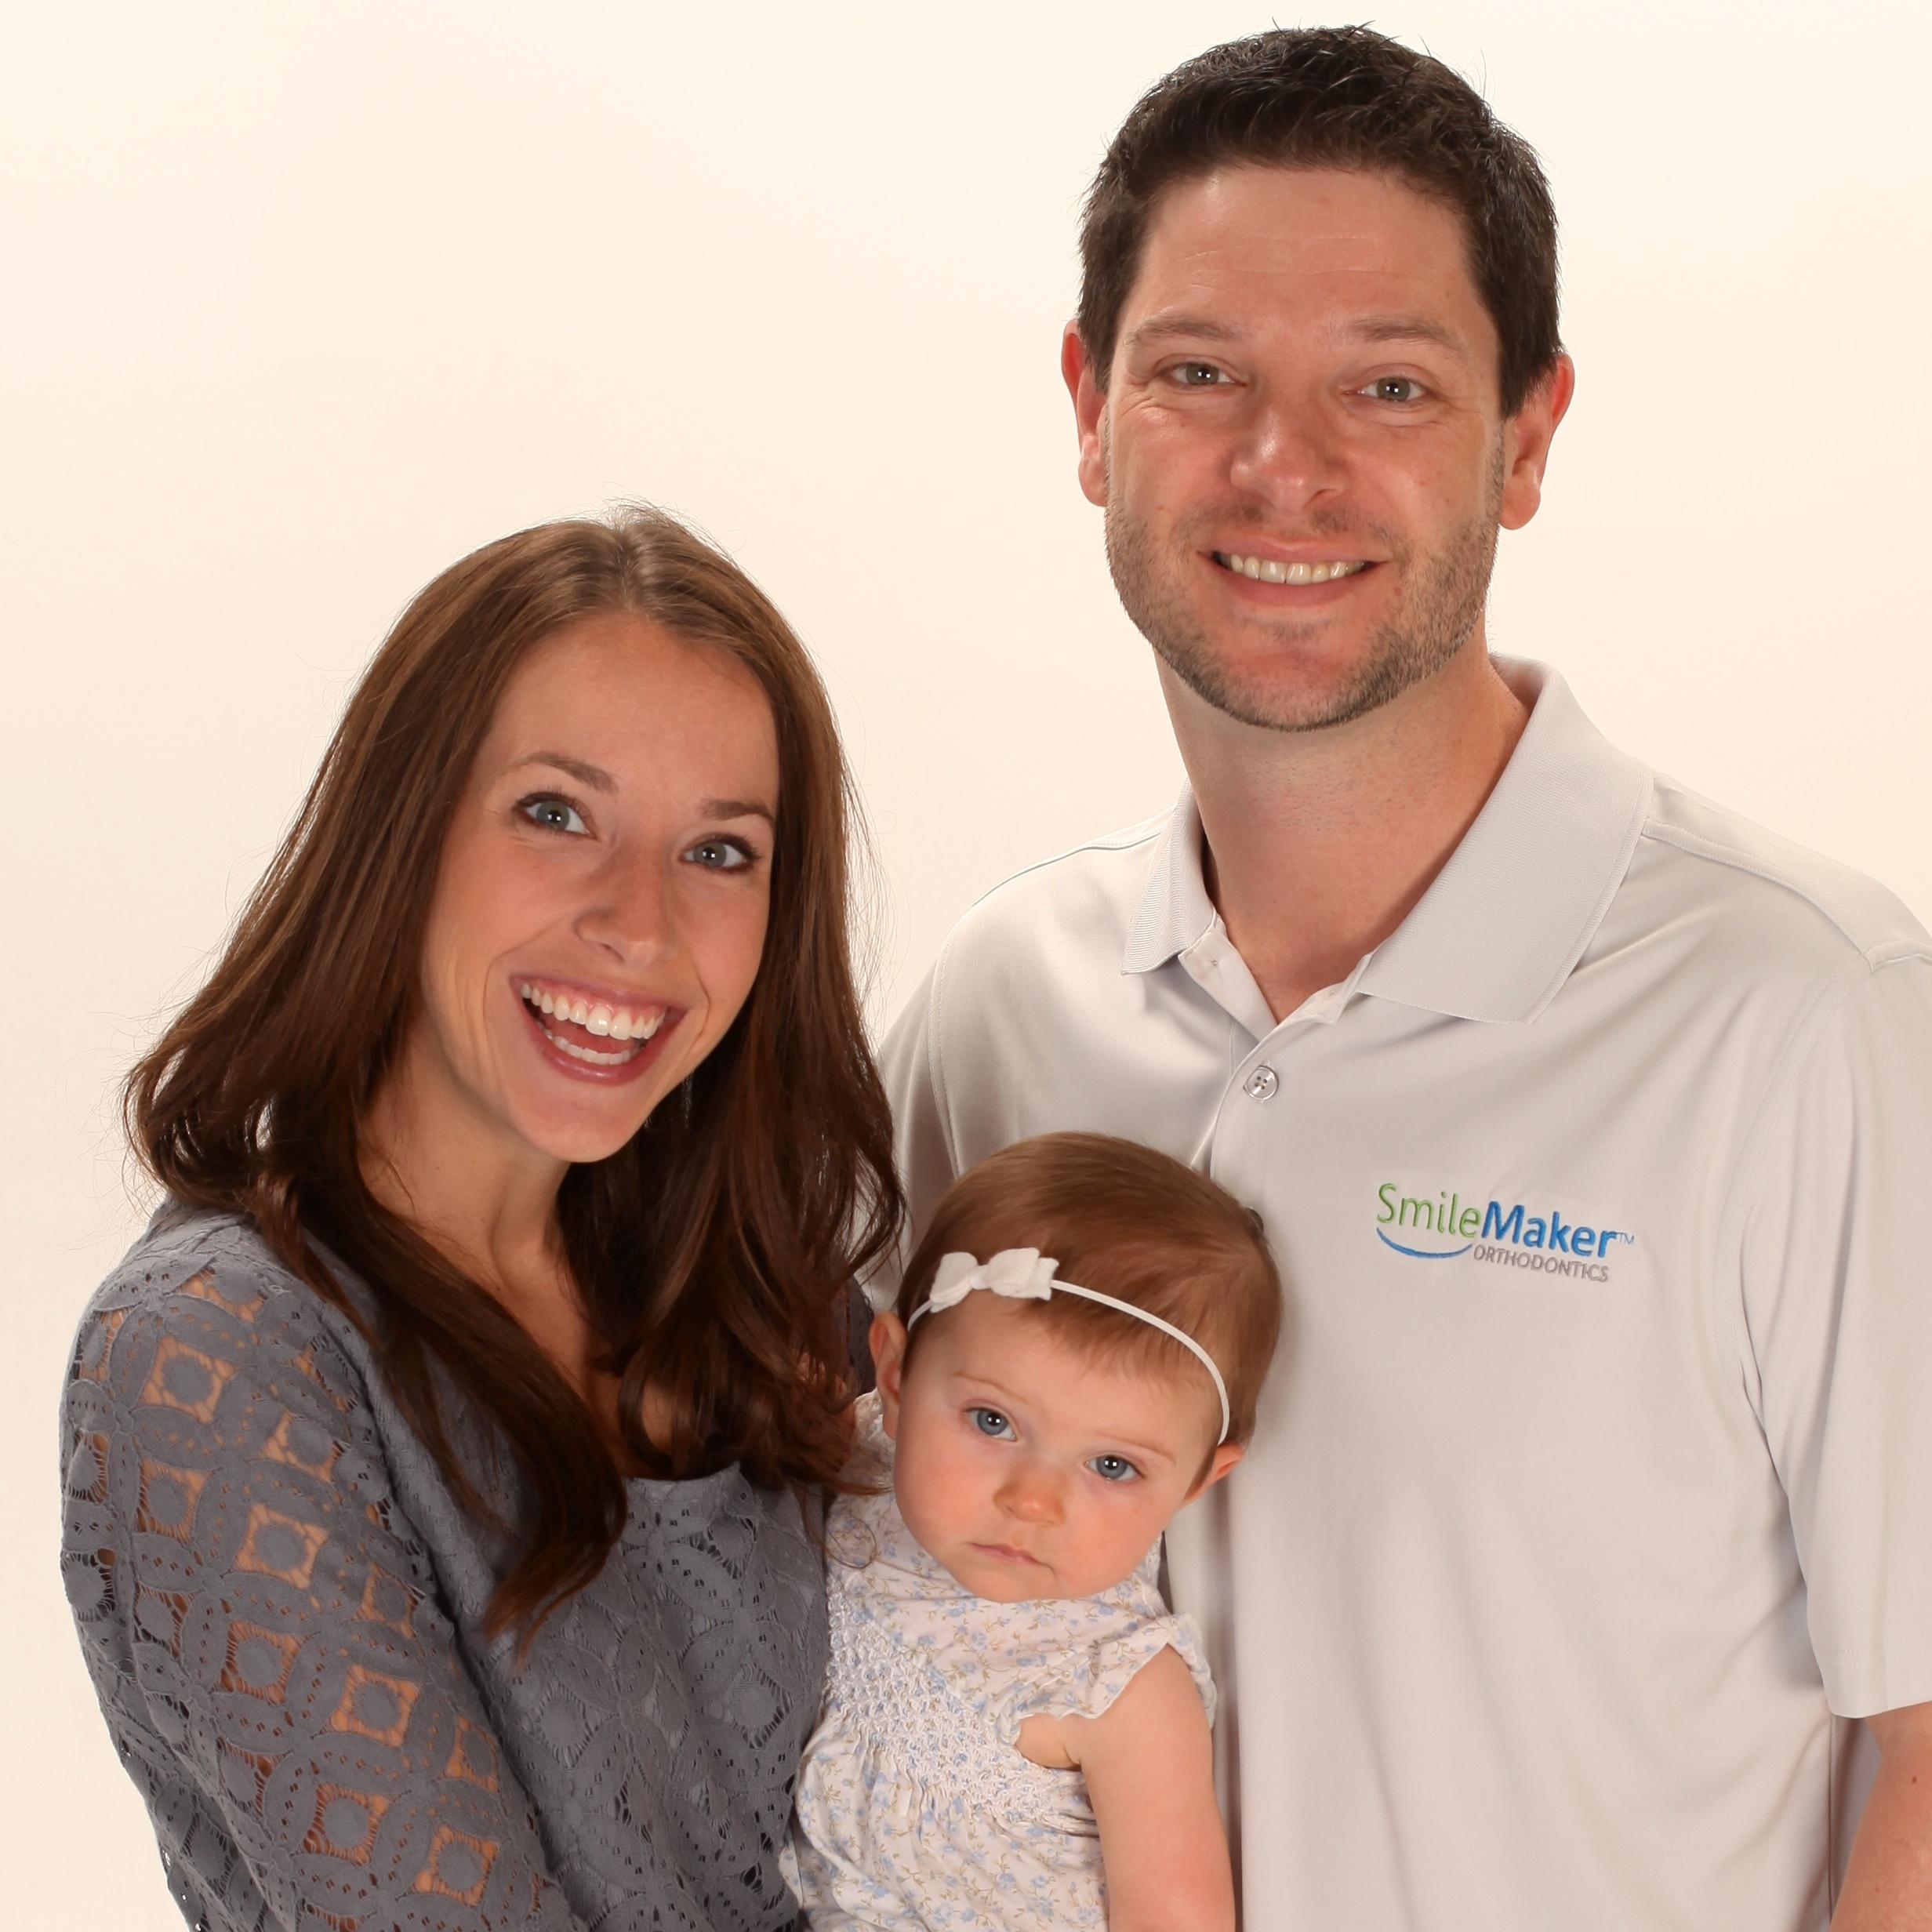 SmileMaker Orthodontics image 2